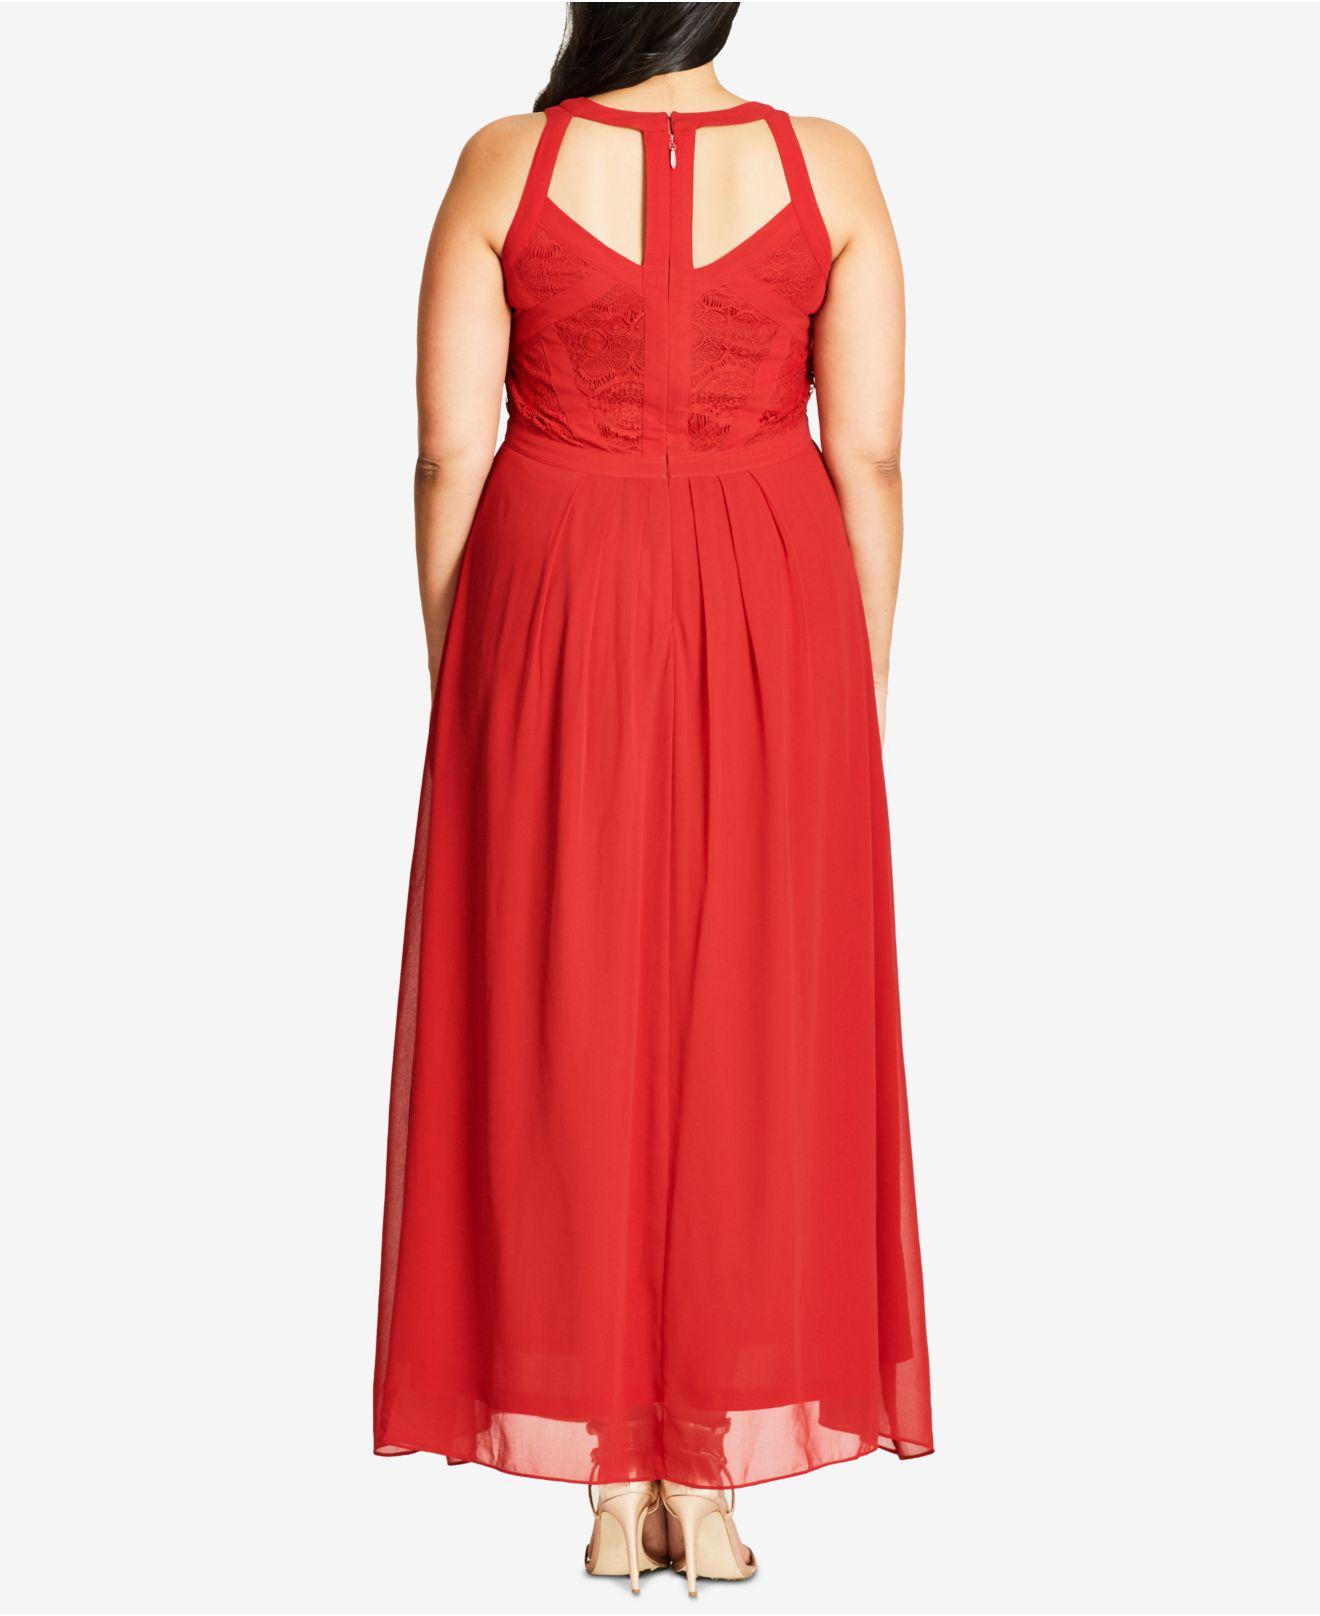 a6d666fda1d Lyst - City Chic Plus Size Sleeveless Maxi Dress in Black